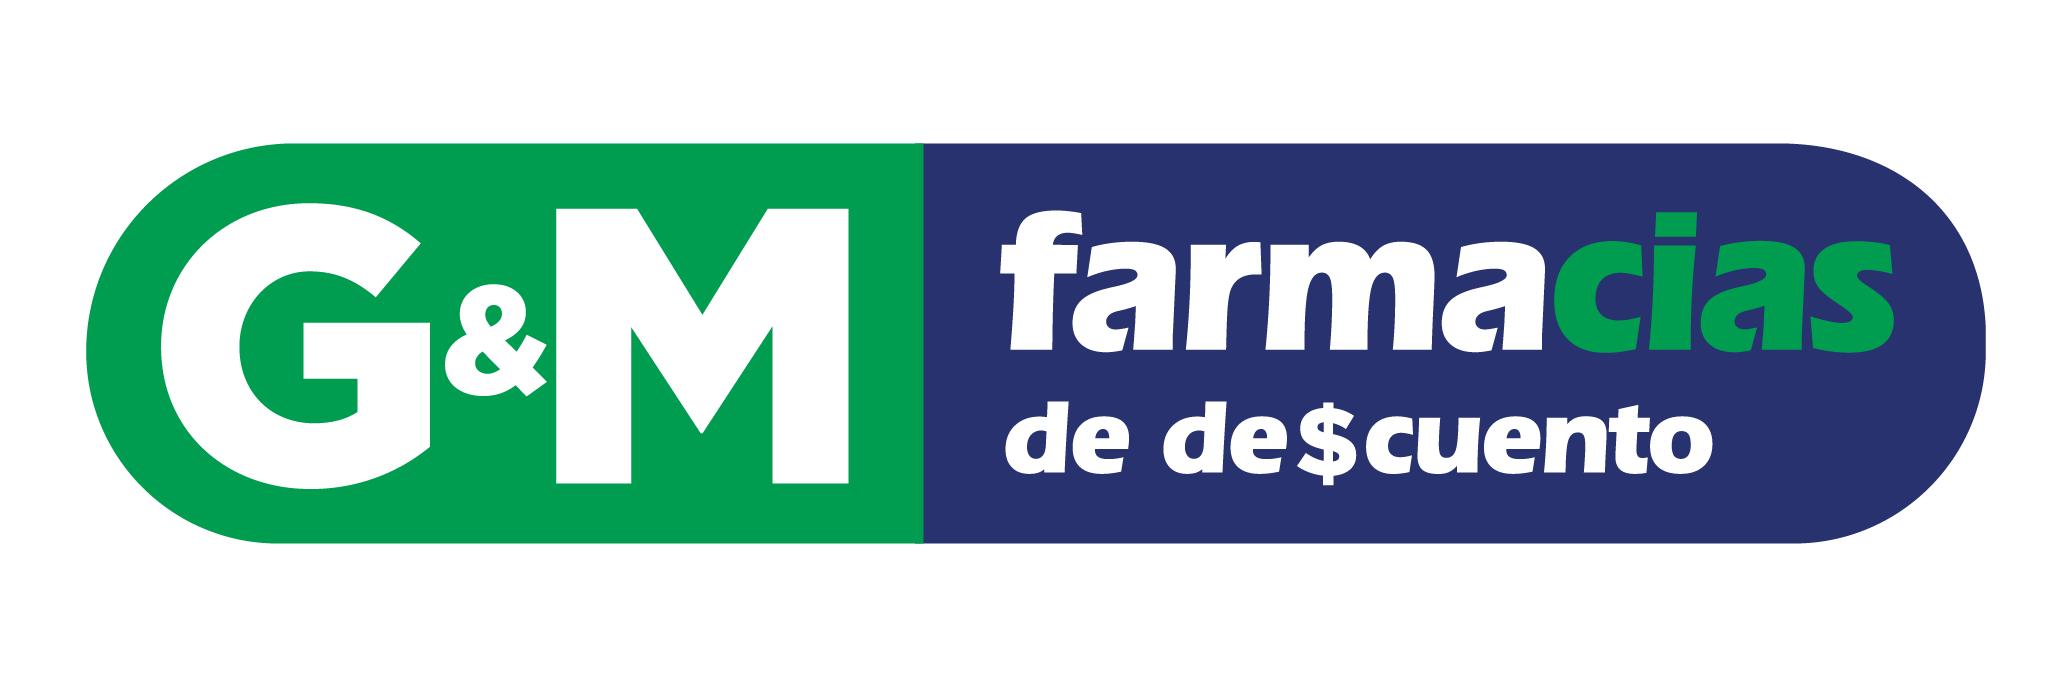 logotipo G&M Farmacias de Descuento